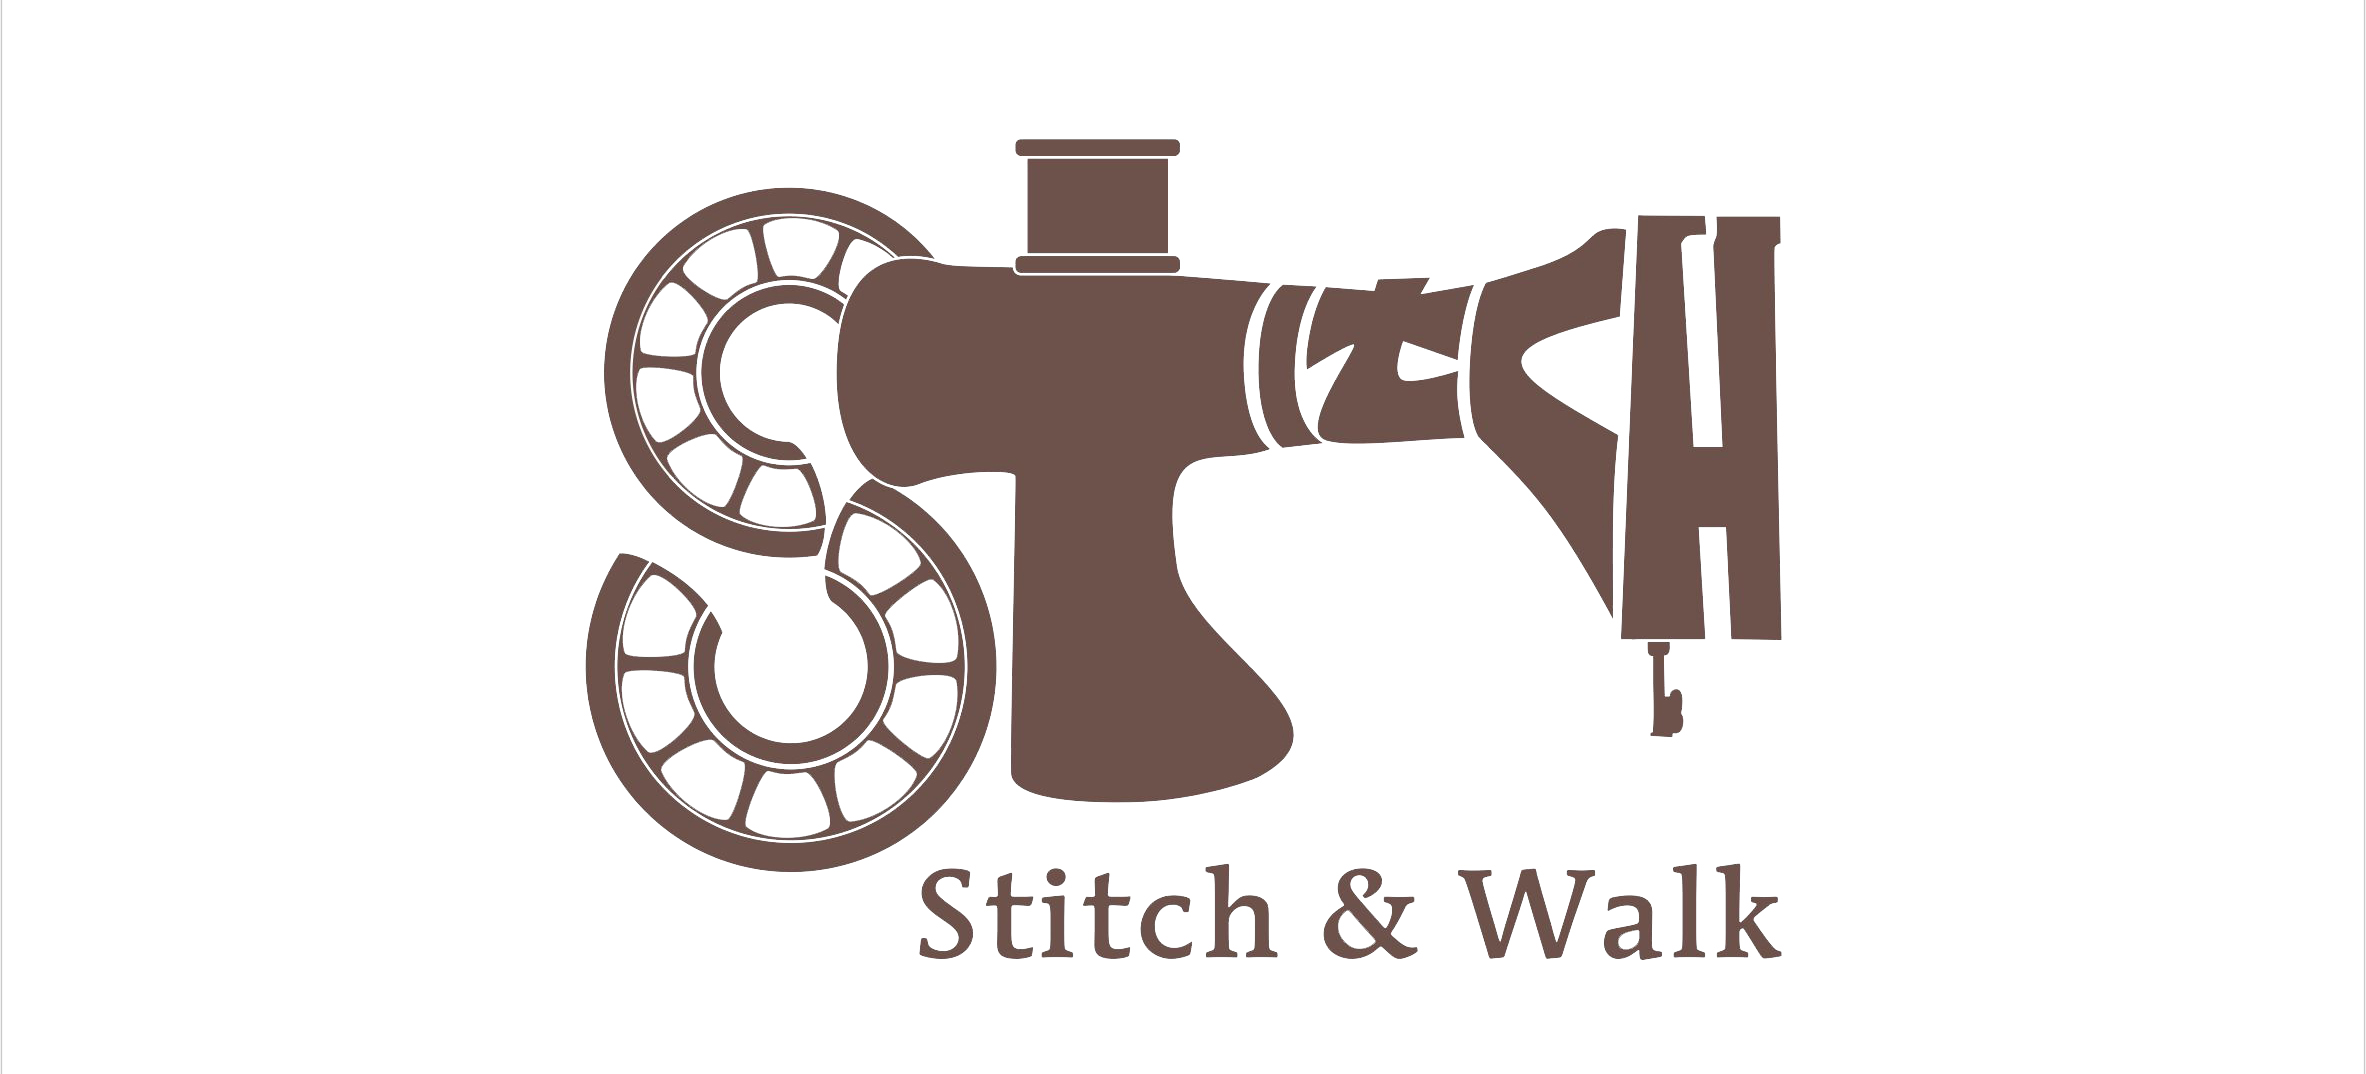 Stitch & Walk